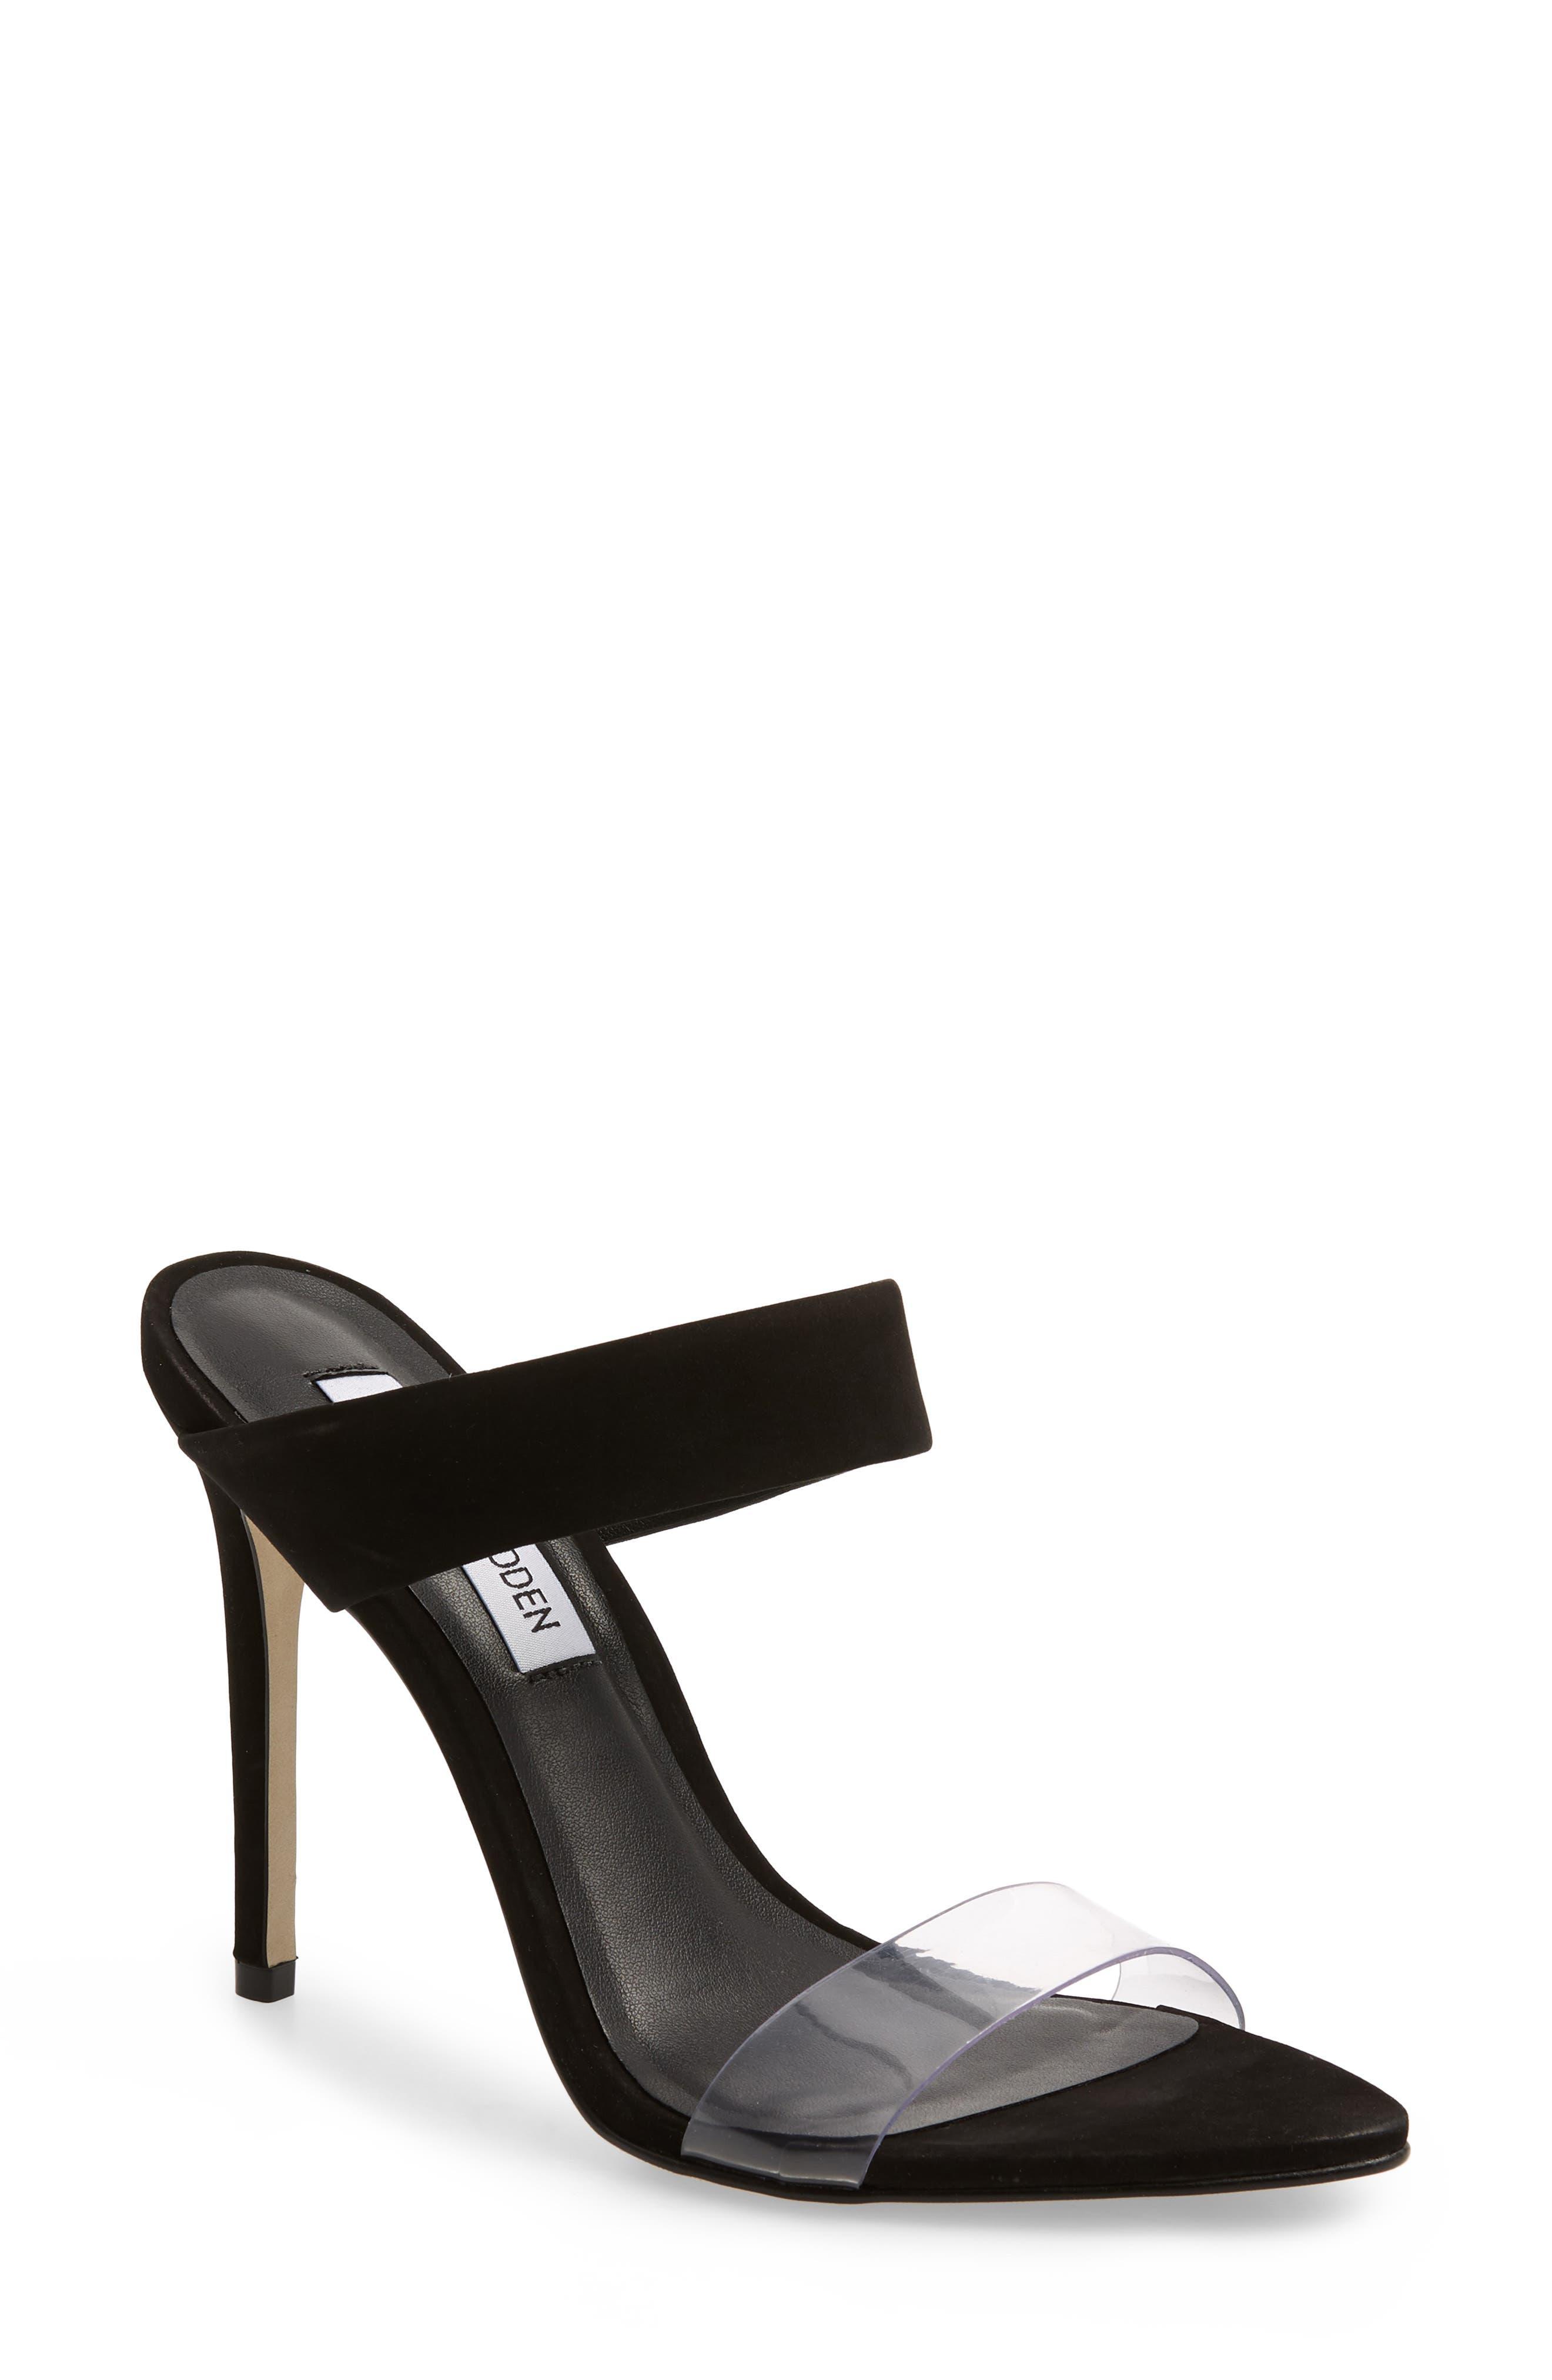 Steve Madden Amaya Clear Slide Sandal- Black